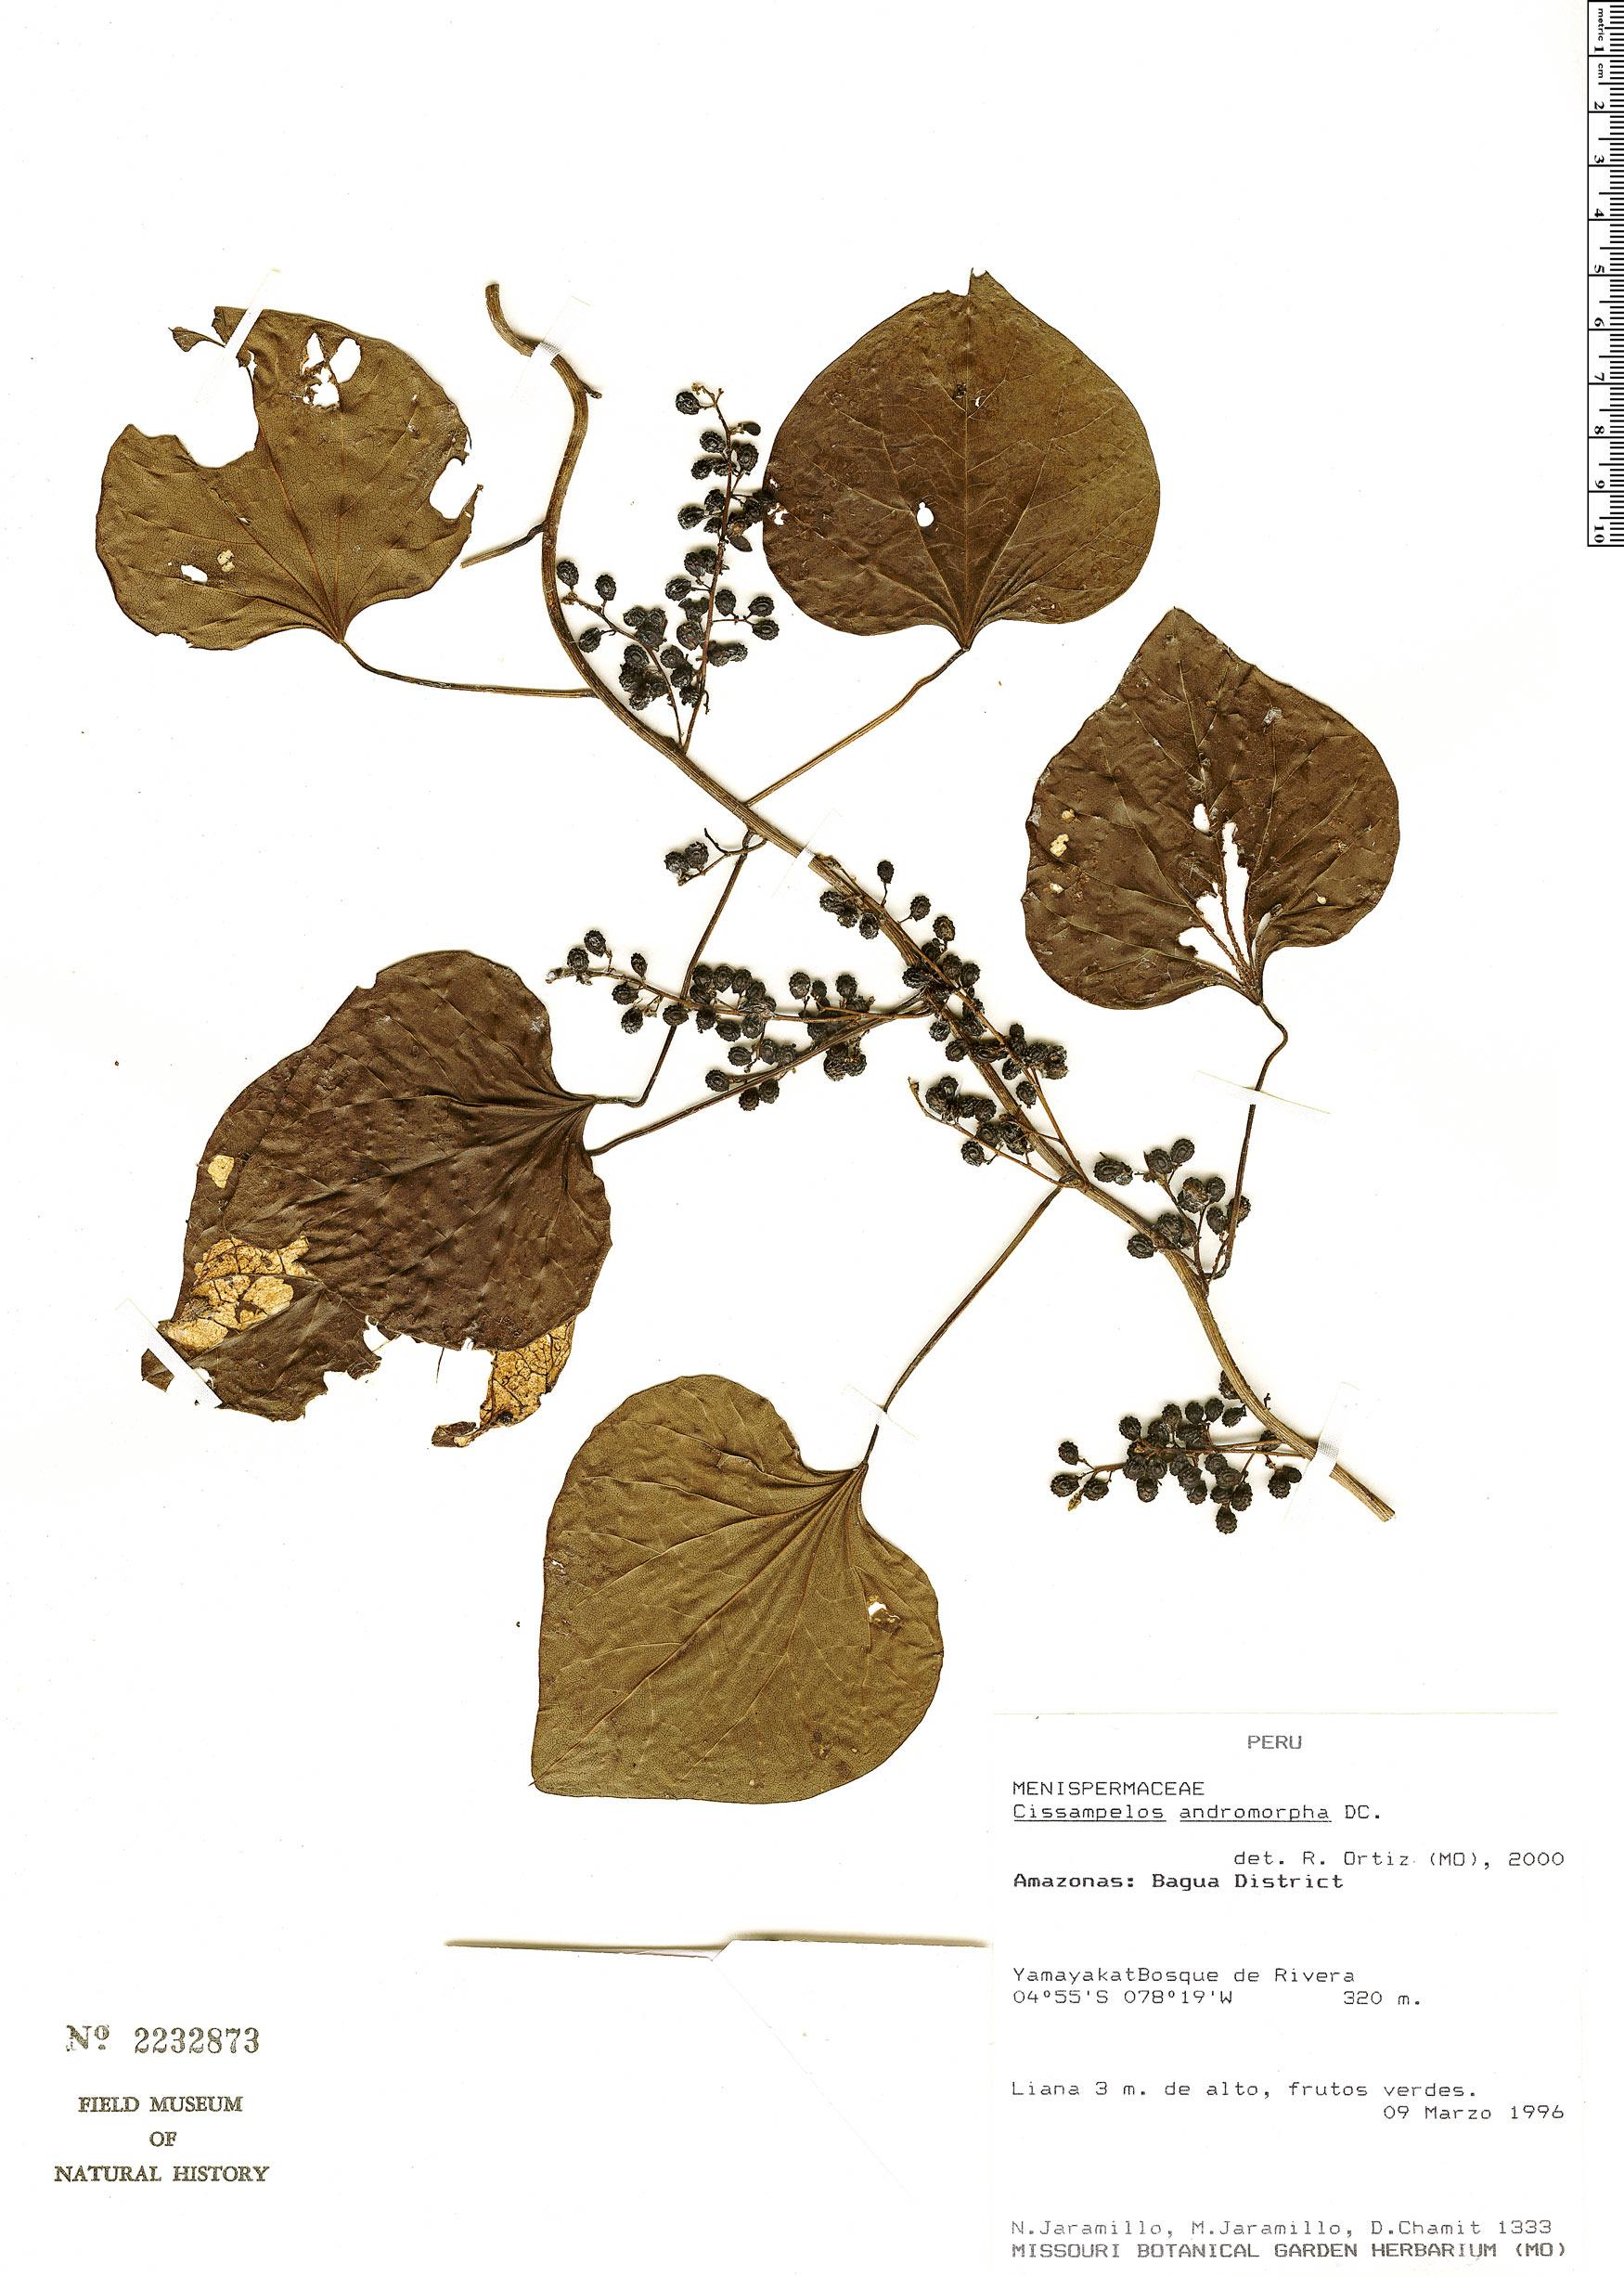 Specimen: Cissampelos andromorpha